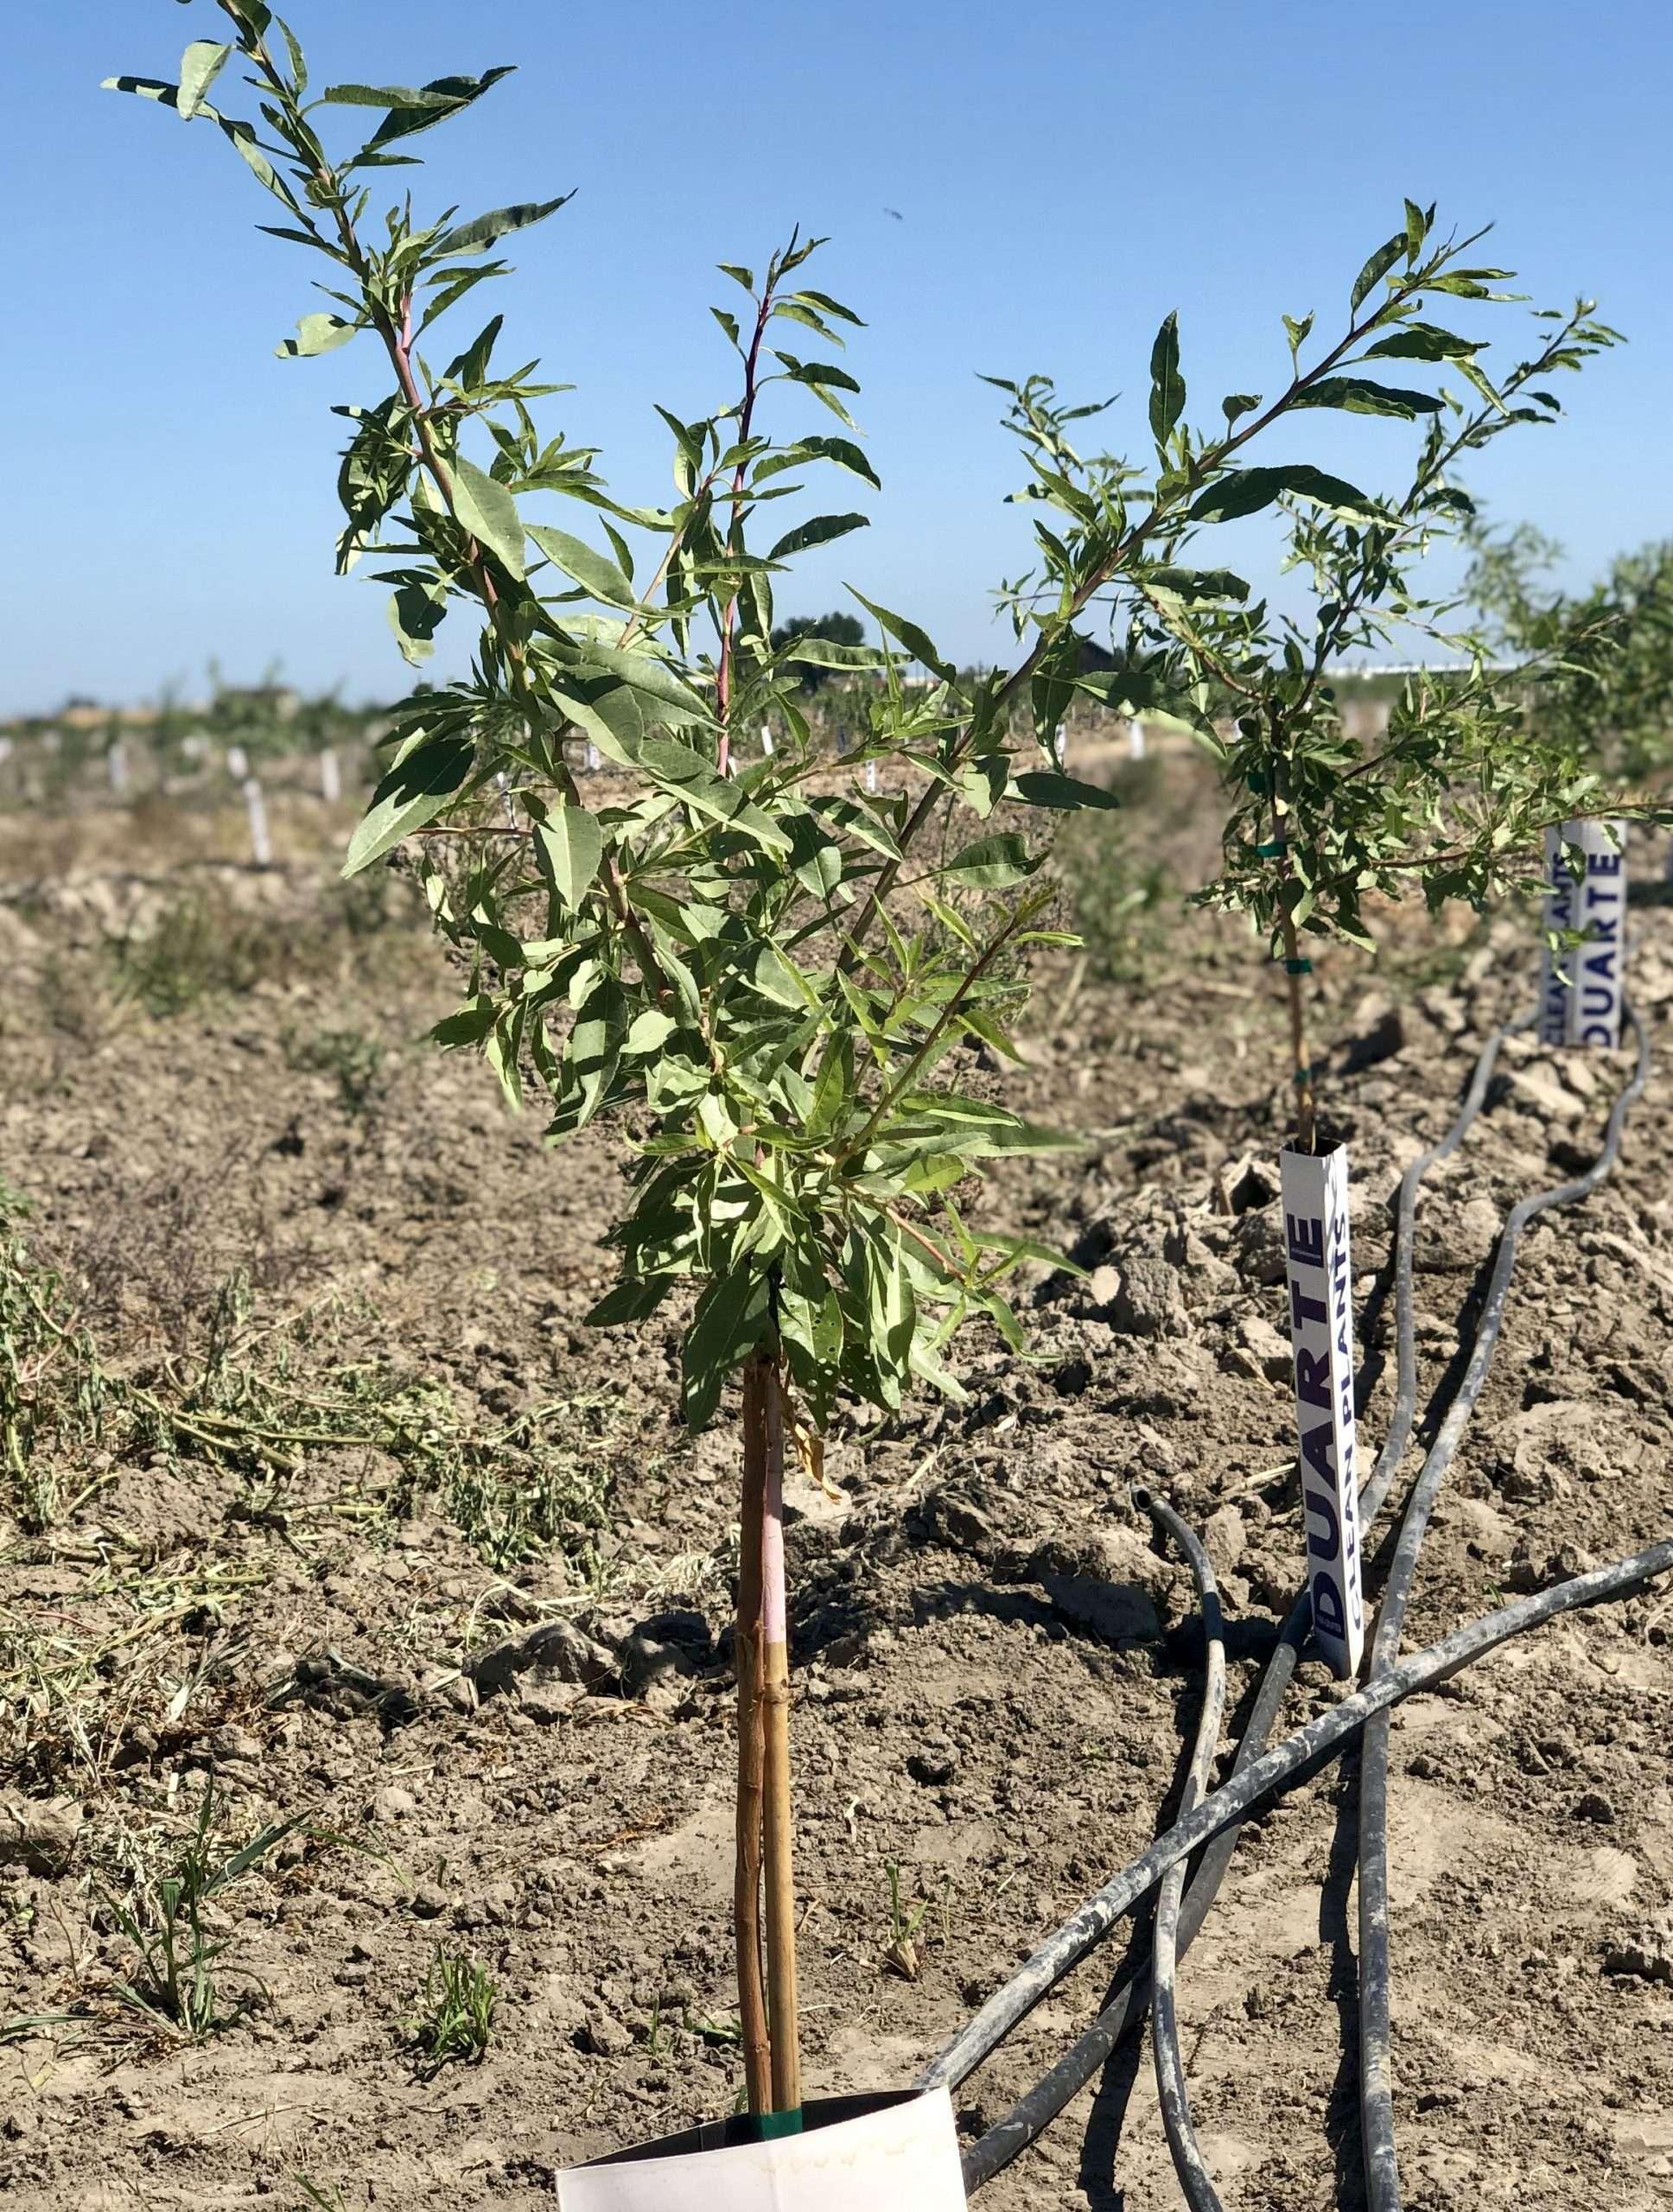 167.35 Acres Almonds – Turlock, CA